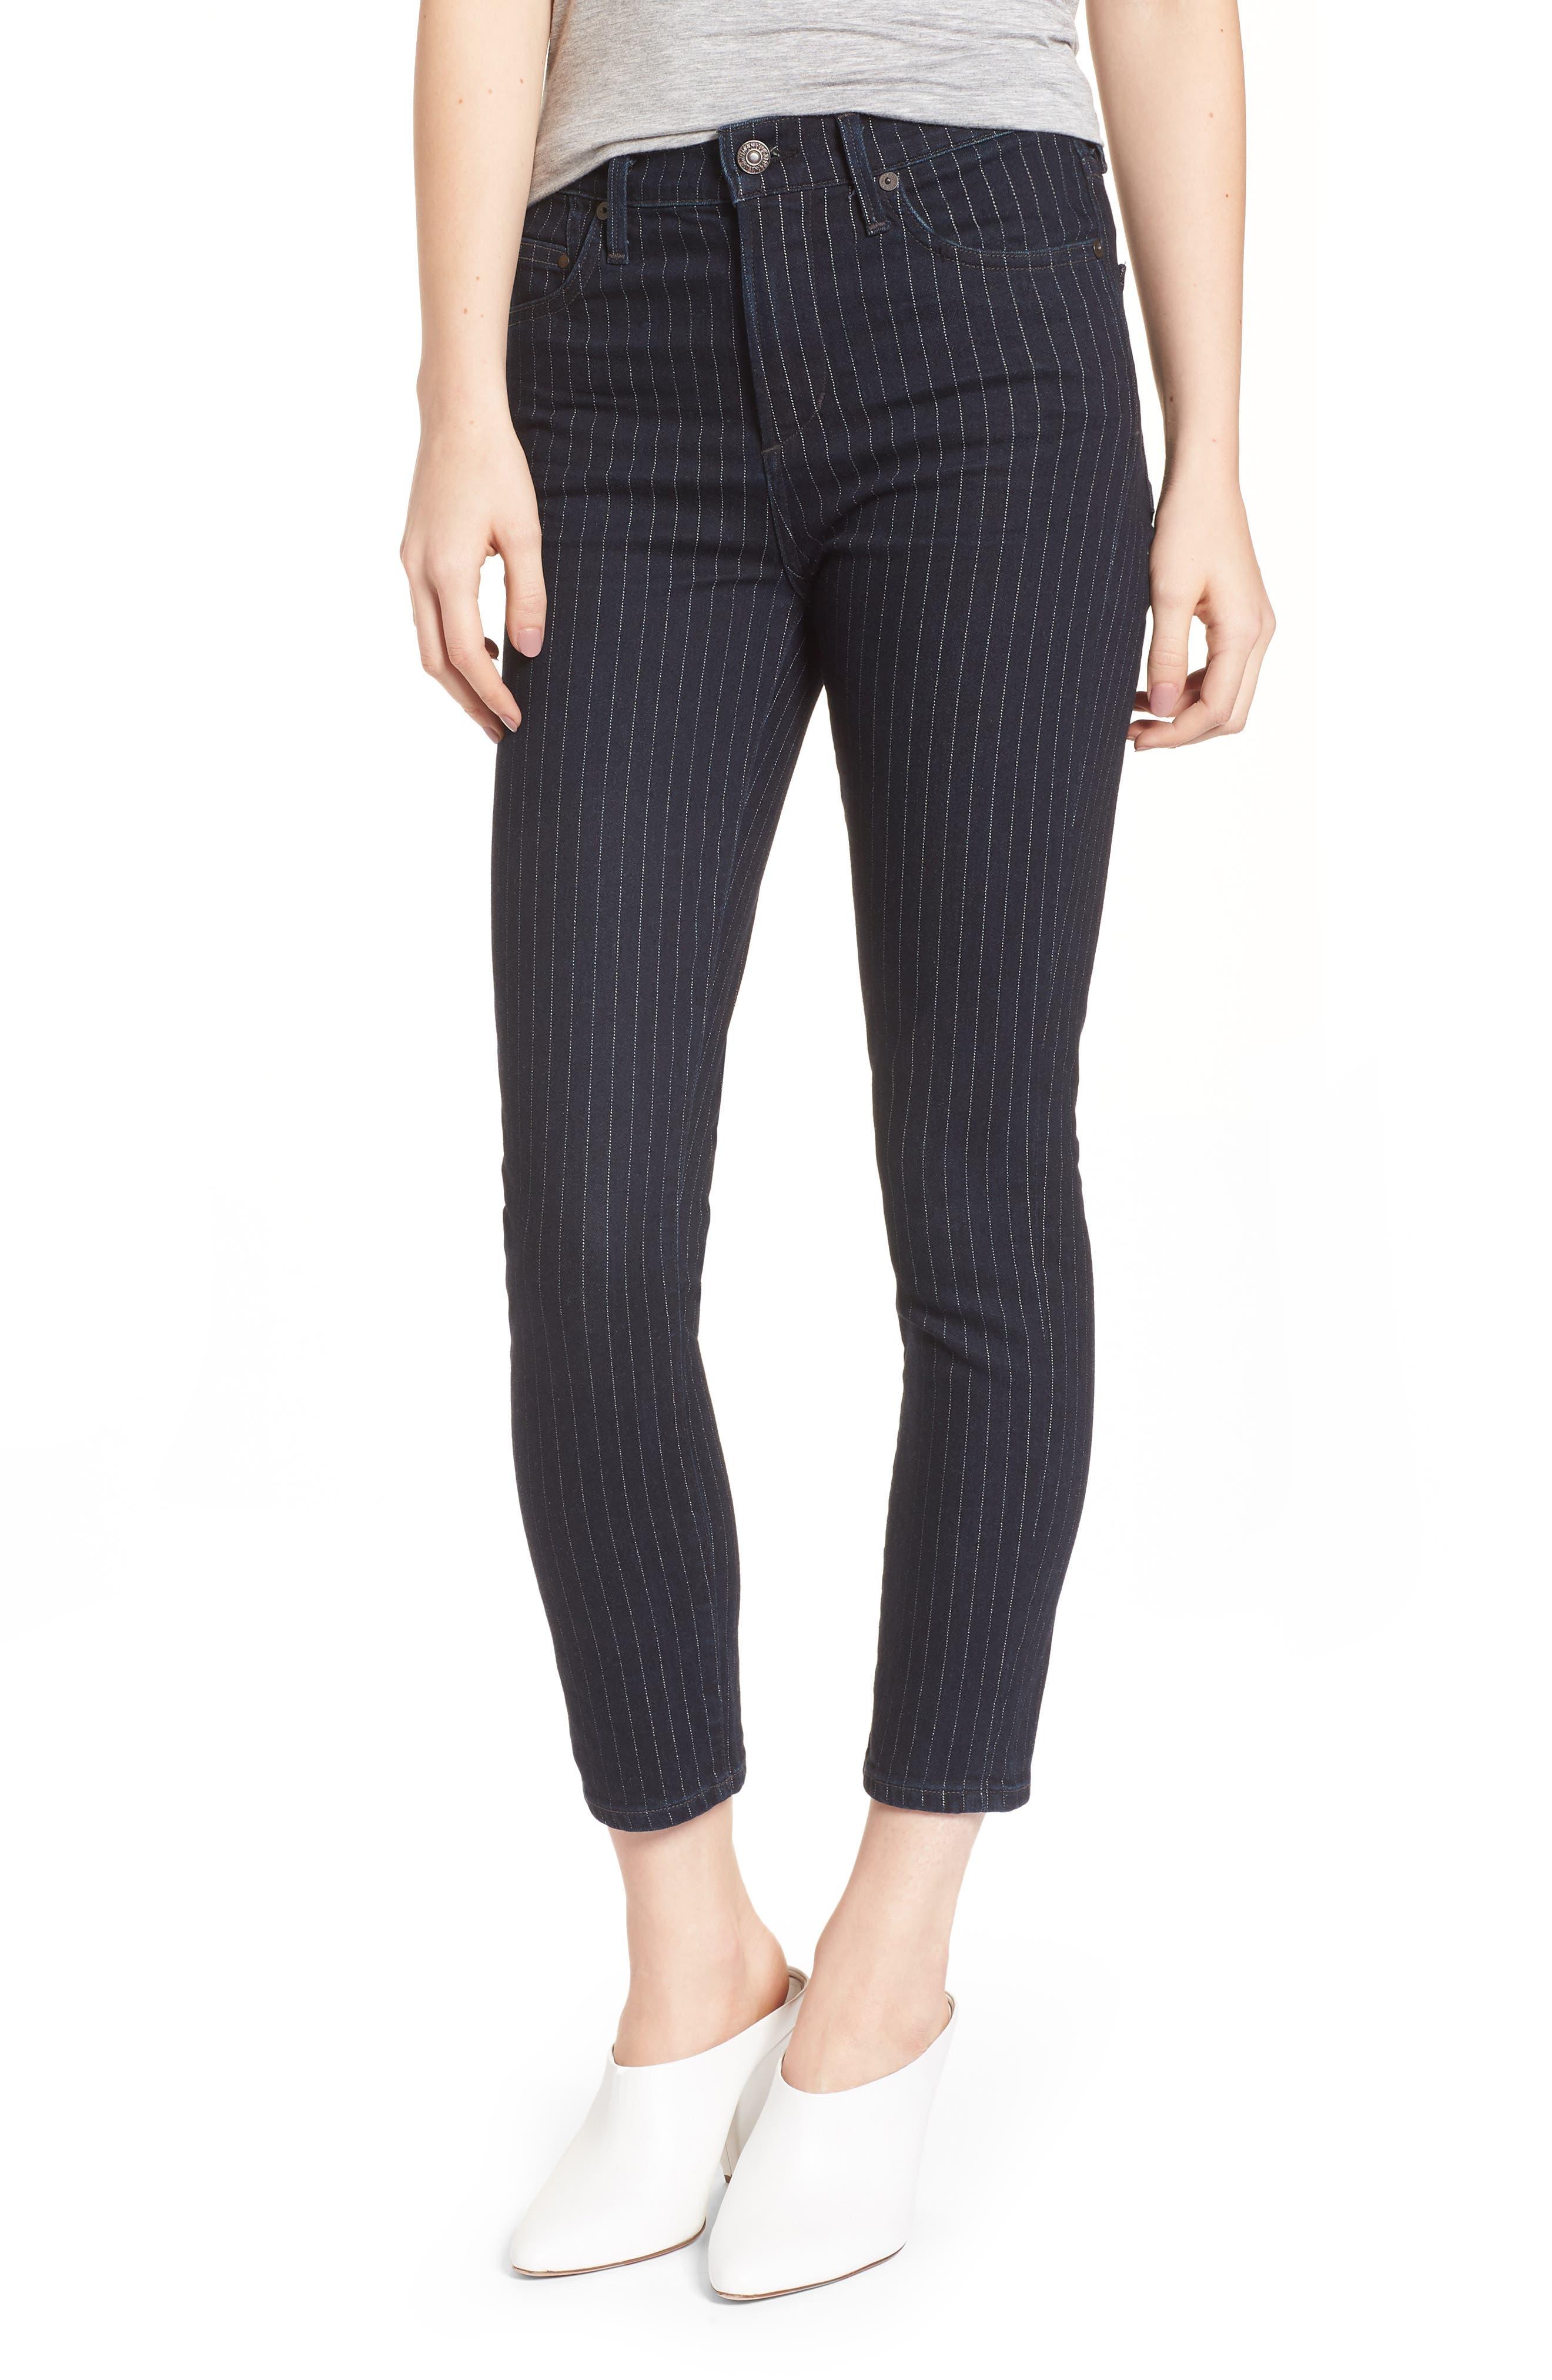 Rocket High Waist Crop Skinny Jeans,                         Main,                         color, Pinstripe